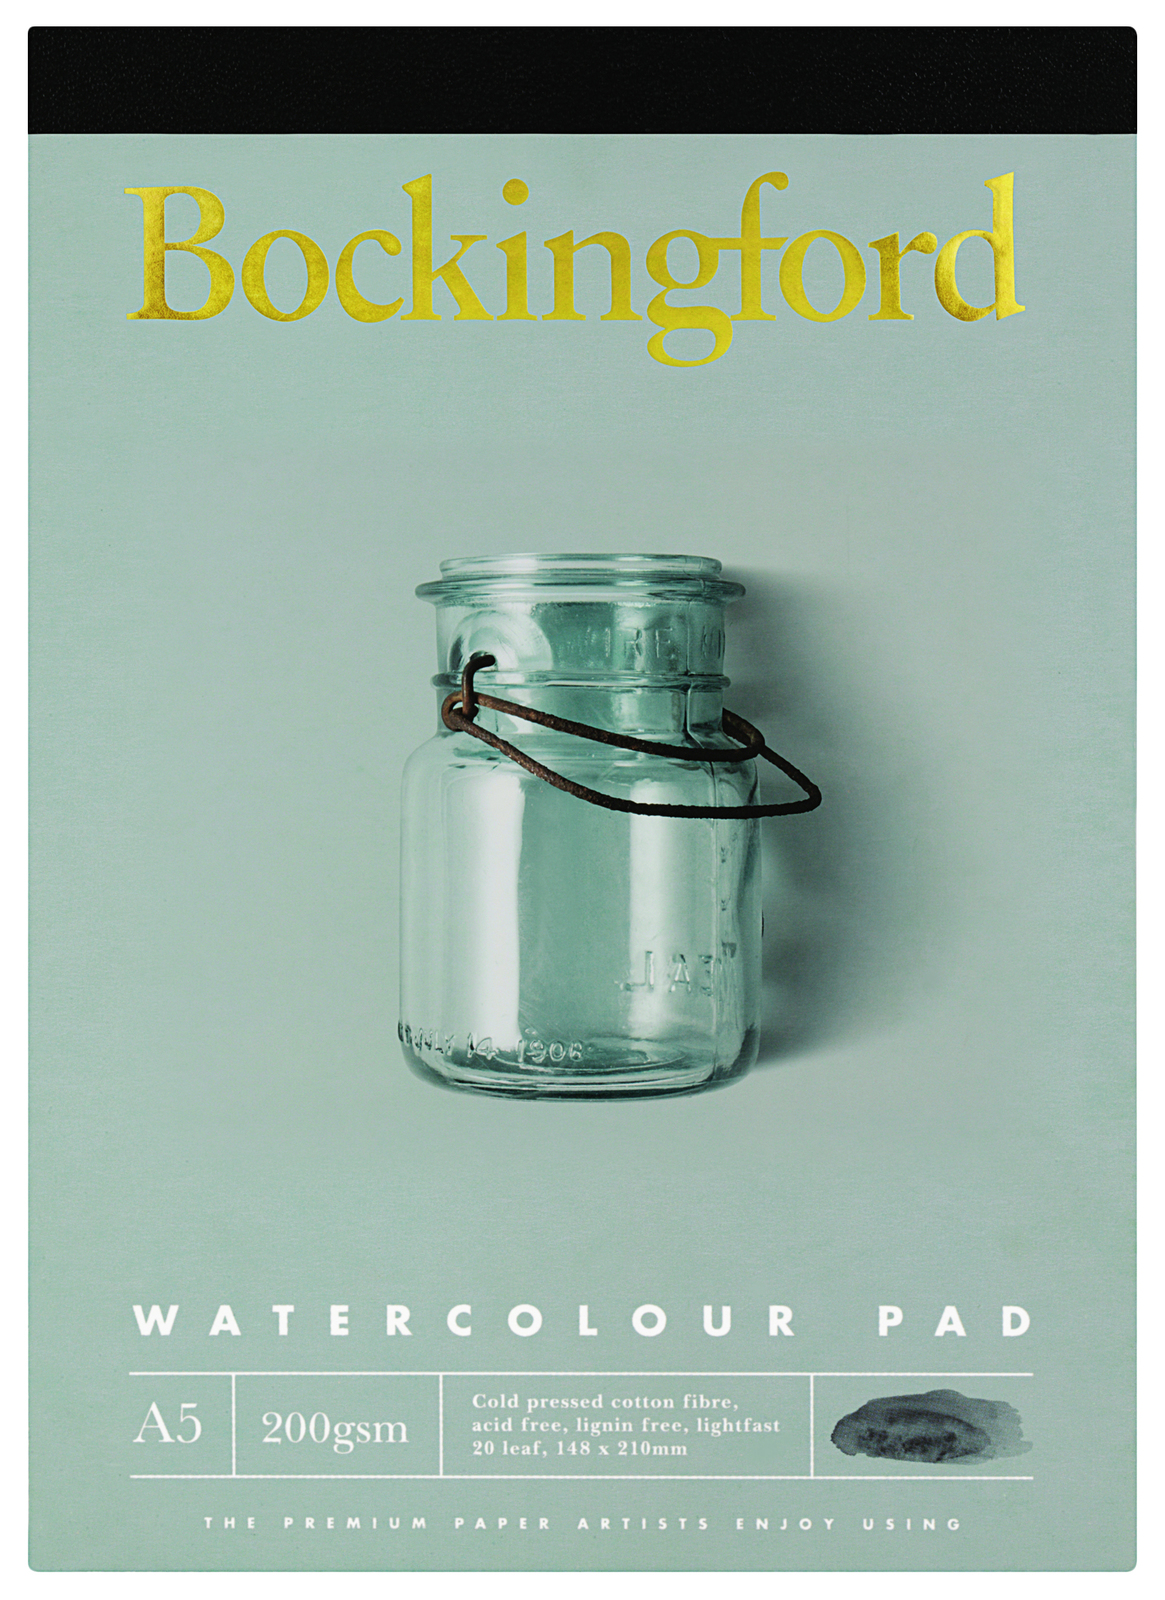 Bockingford: A5 200GSM Watercolour Pad - 20 Leaf image